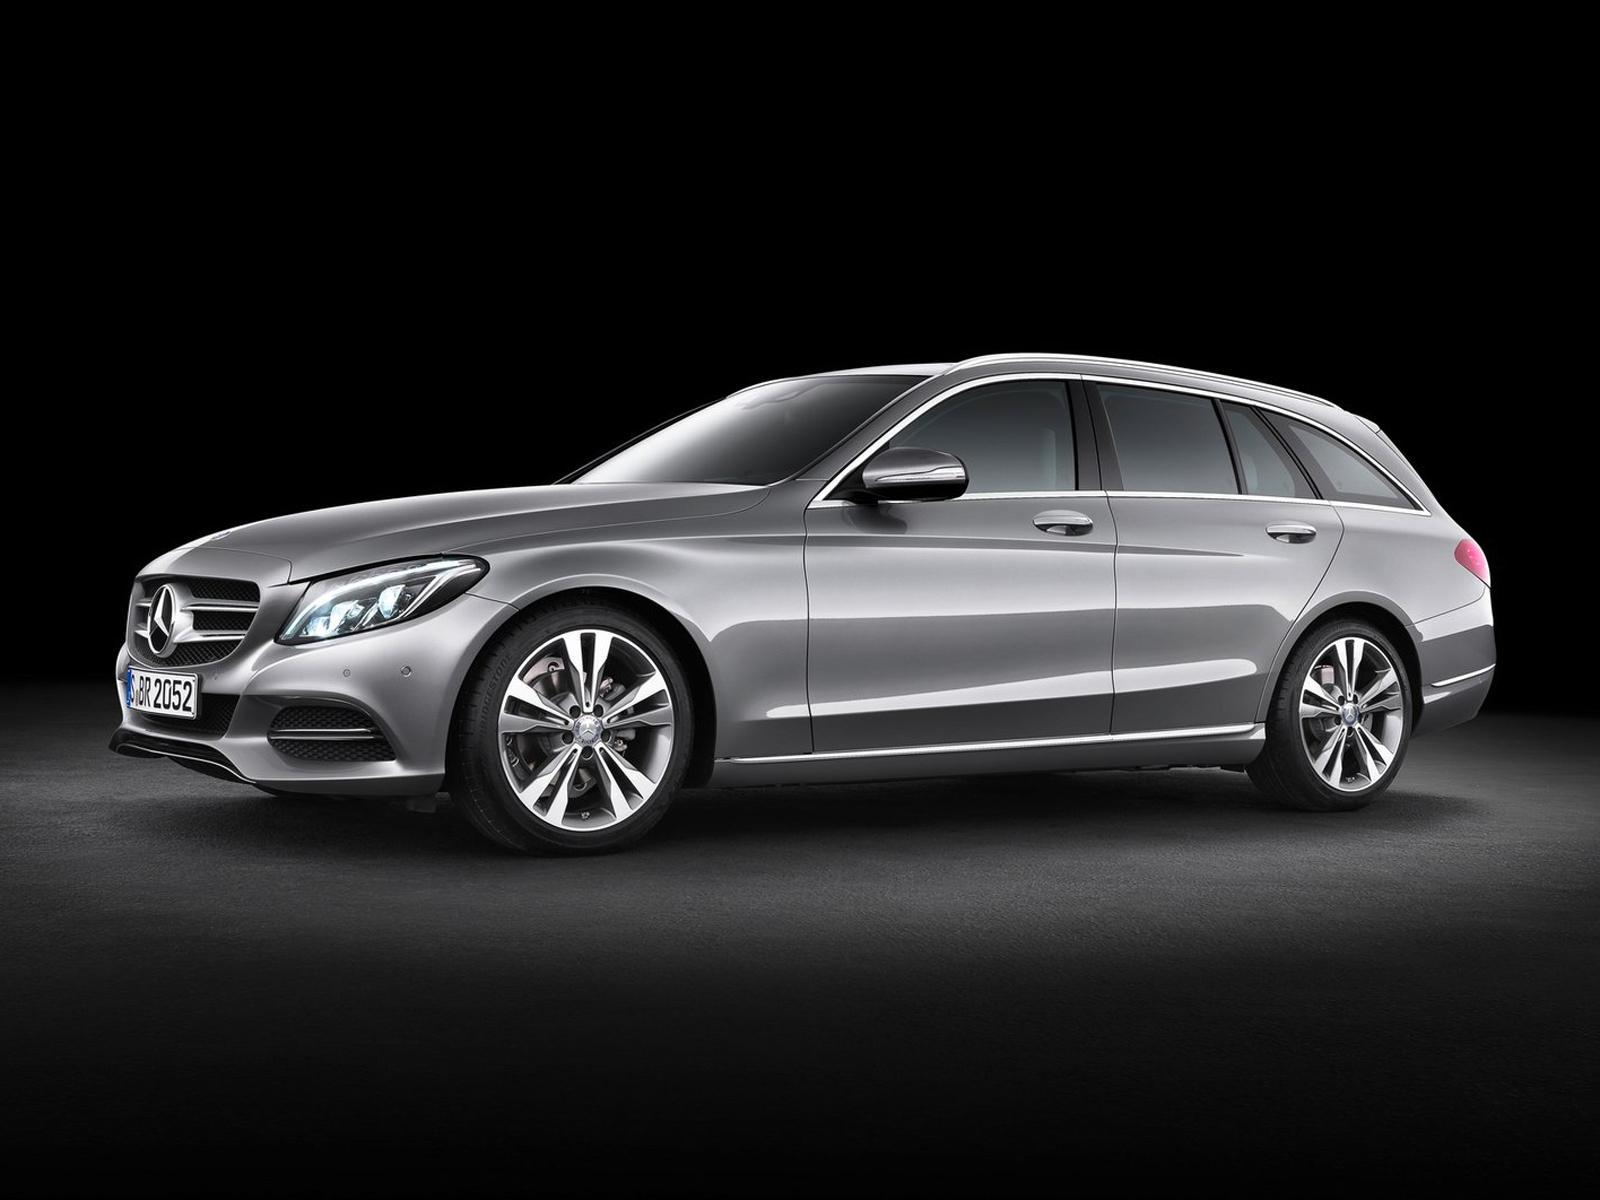 Ford Smart Mobility >> Mercedes Clase C Estate 2014 43 AMG 4Matic -- Autobild.es